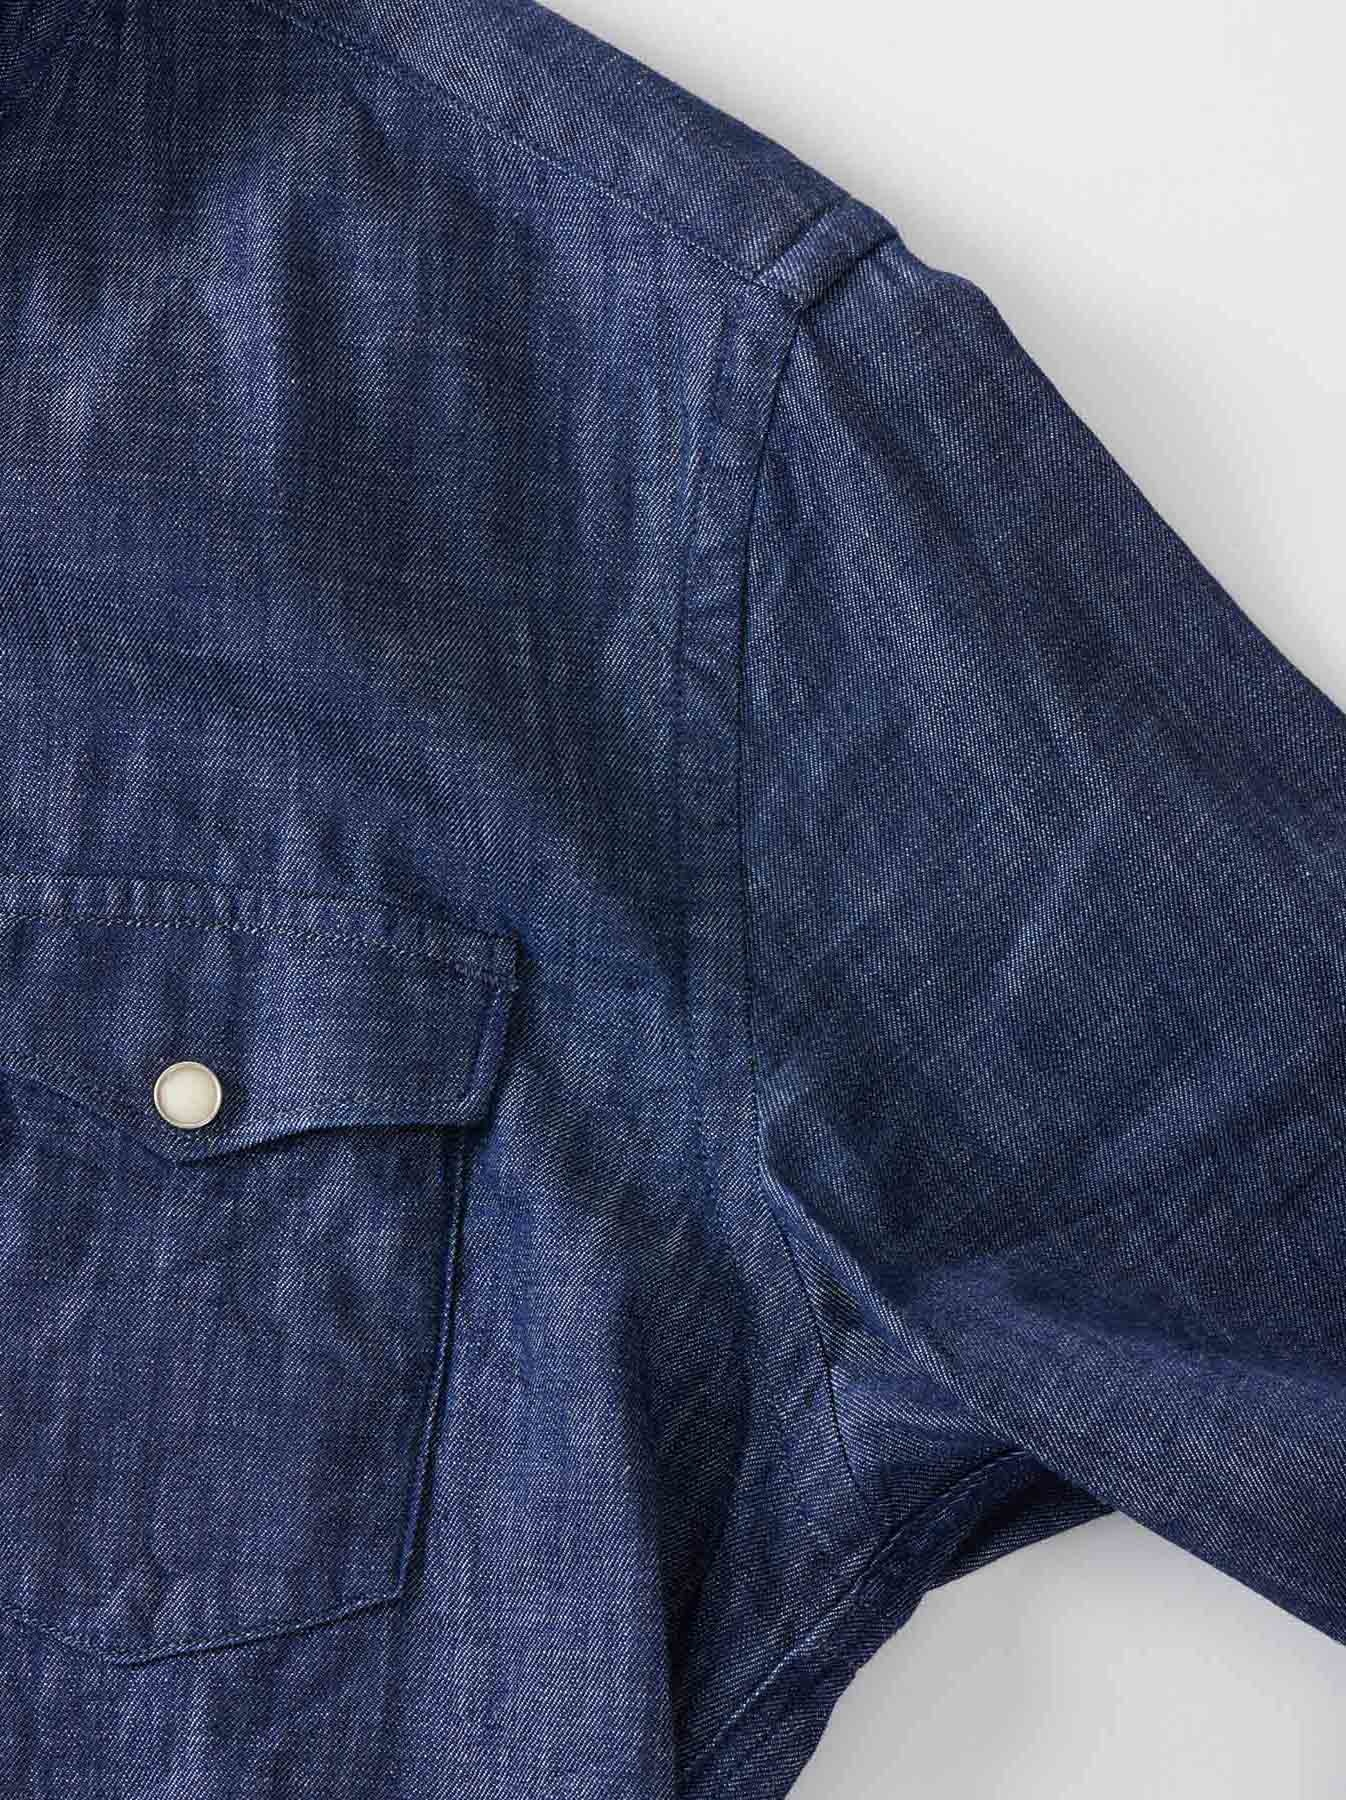 Goma Denim Stand Collar Eastern Shirt-9